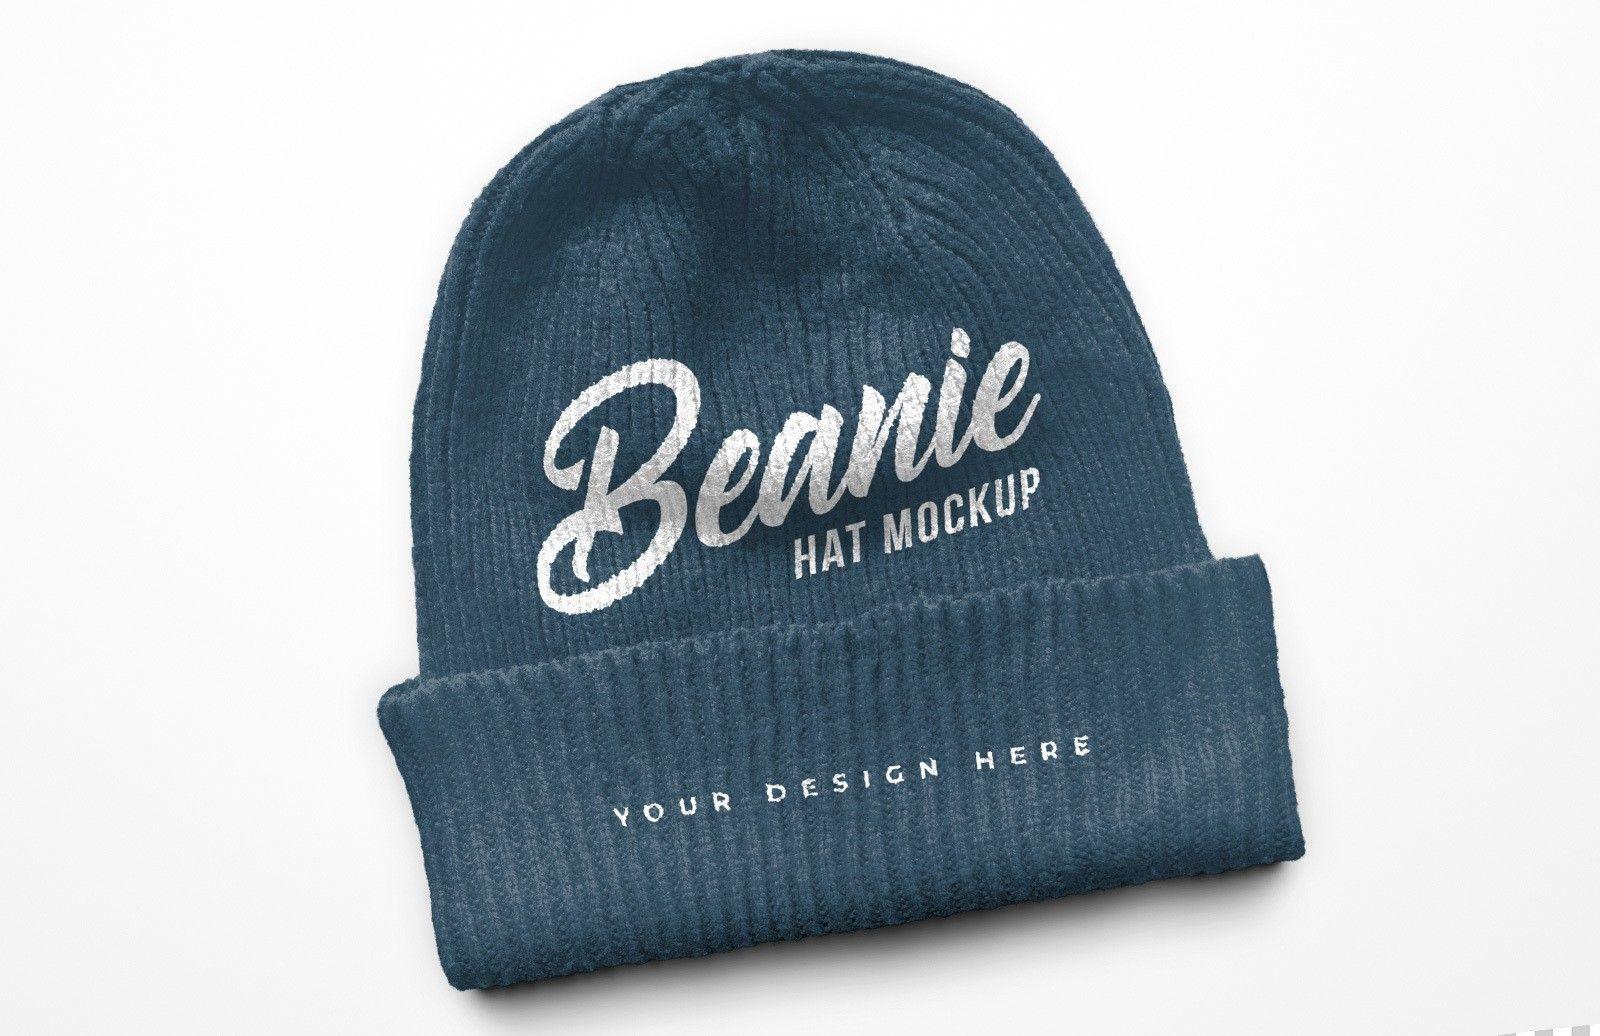 Download Beanie Winter Hat Mockup Beanie Hats Winter Hats